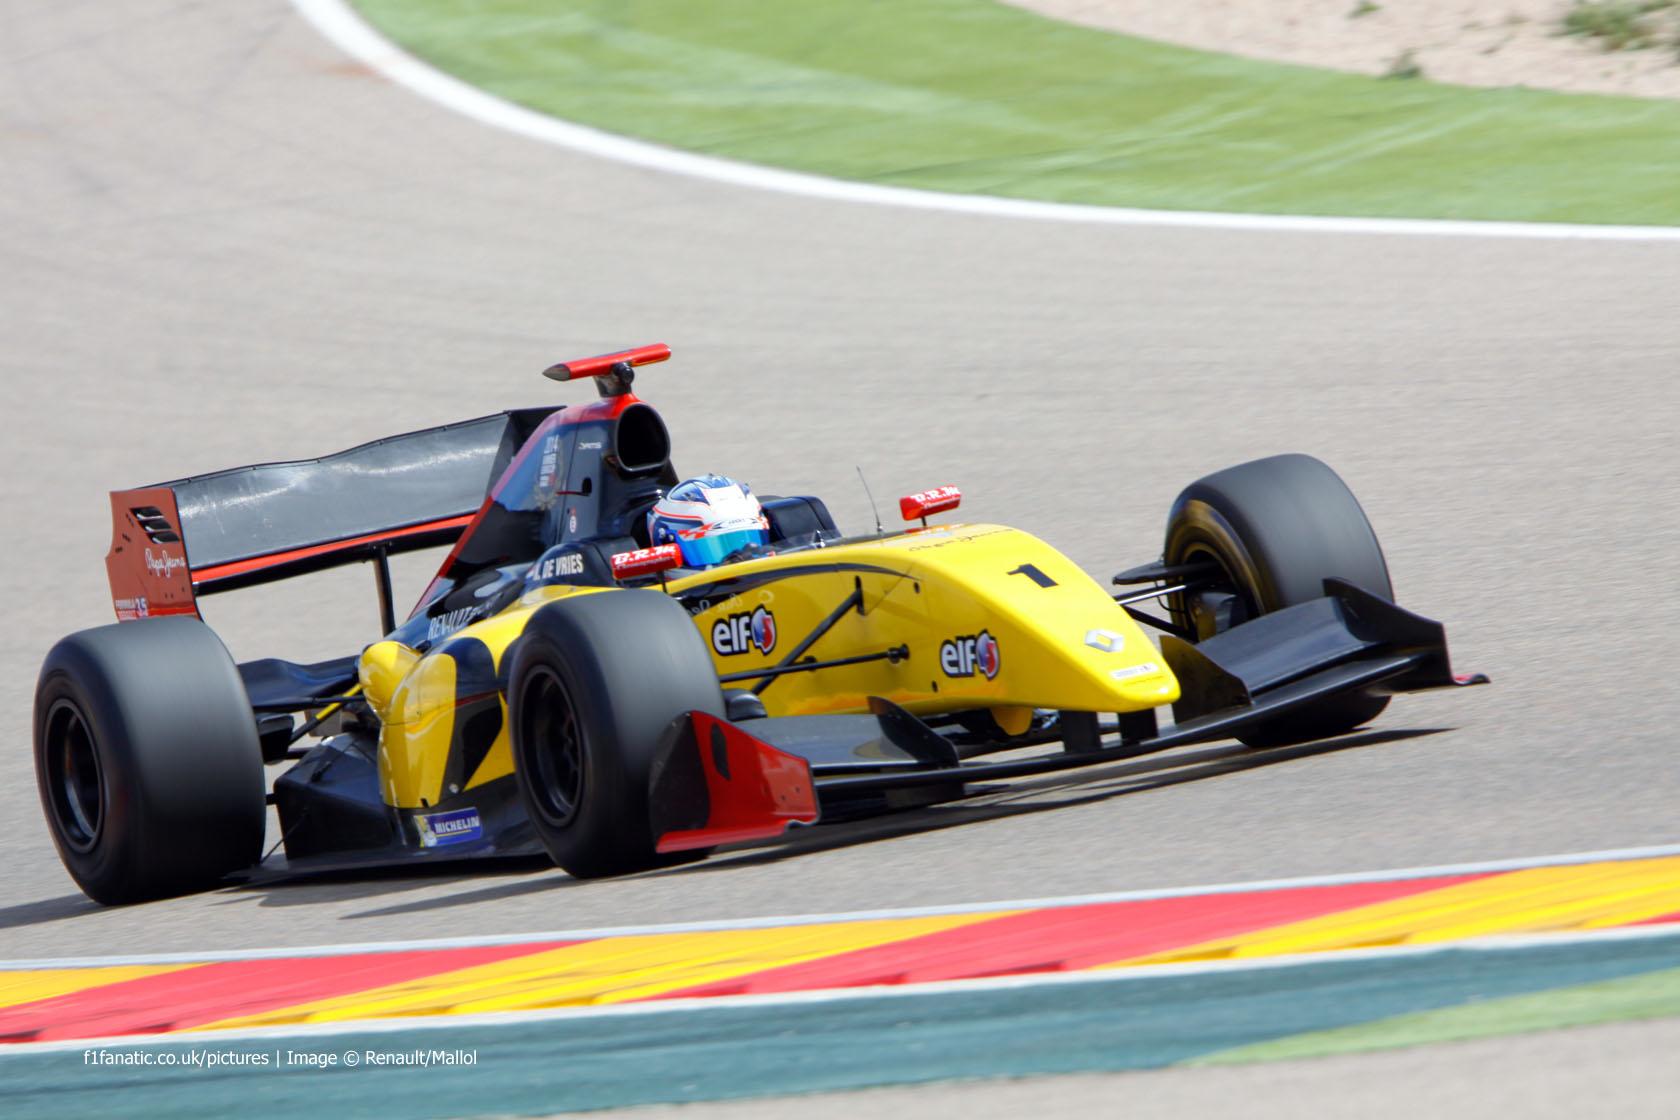 Nyck de Vries DAMS Motorland Aragon Formula Renault 3.5 testing 2015